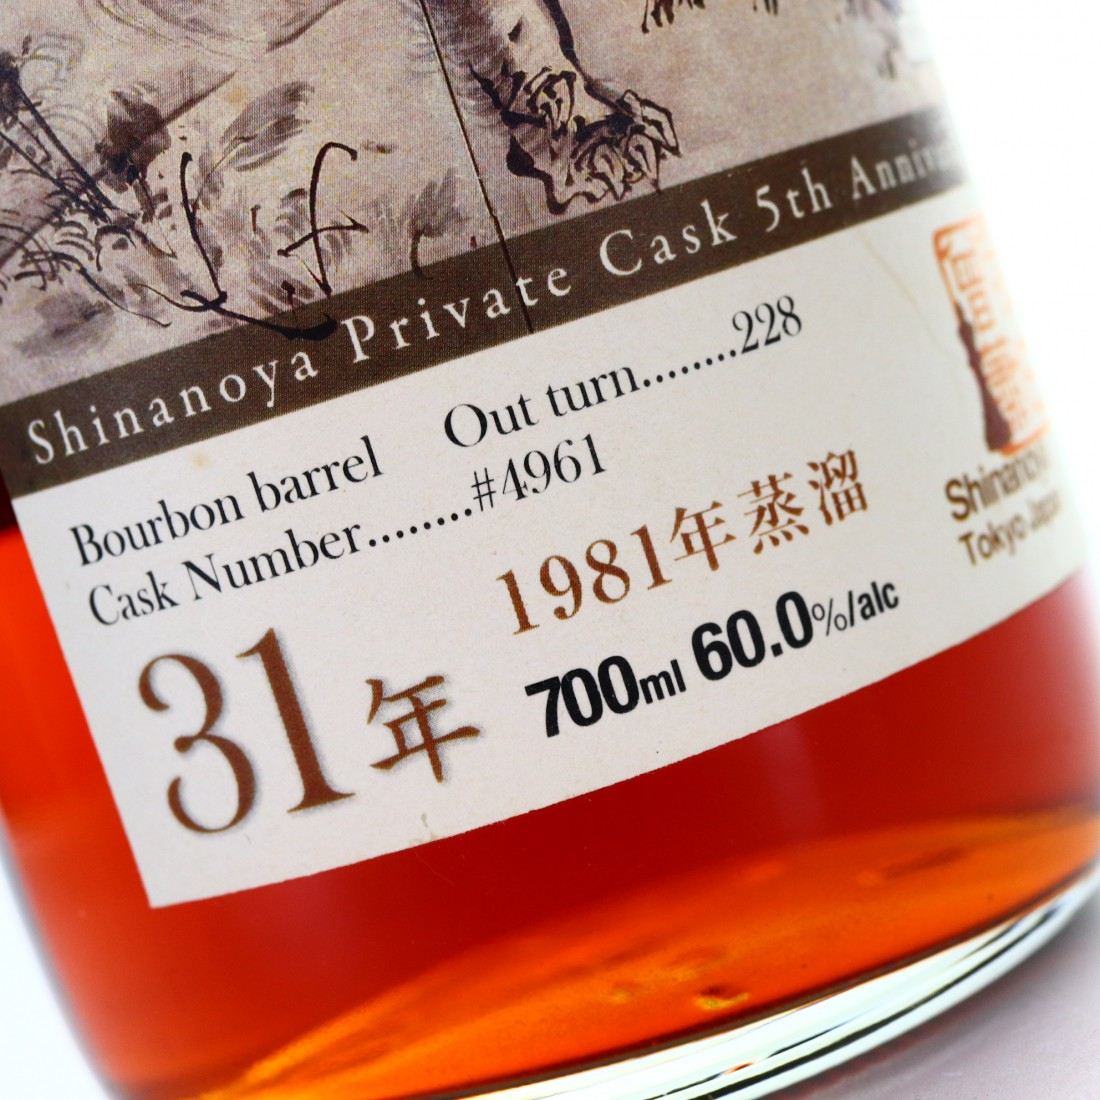 Karuizawa 1981 31 Year Old #4961 & 1995 16 Year Old #5006 2 x 70cl / ShinanoyaPrivate Cask5th Anniversary